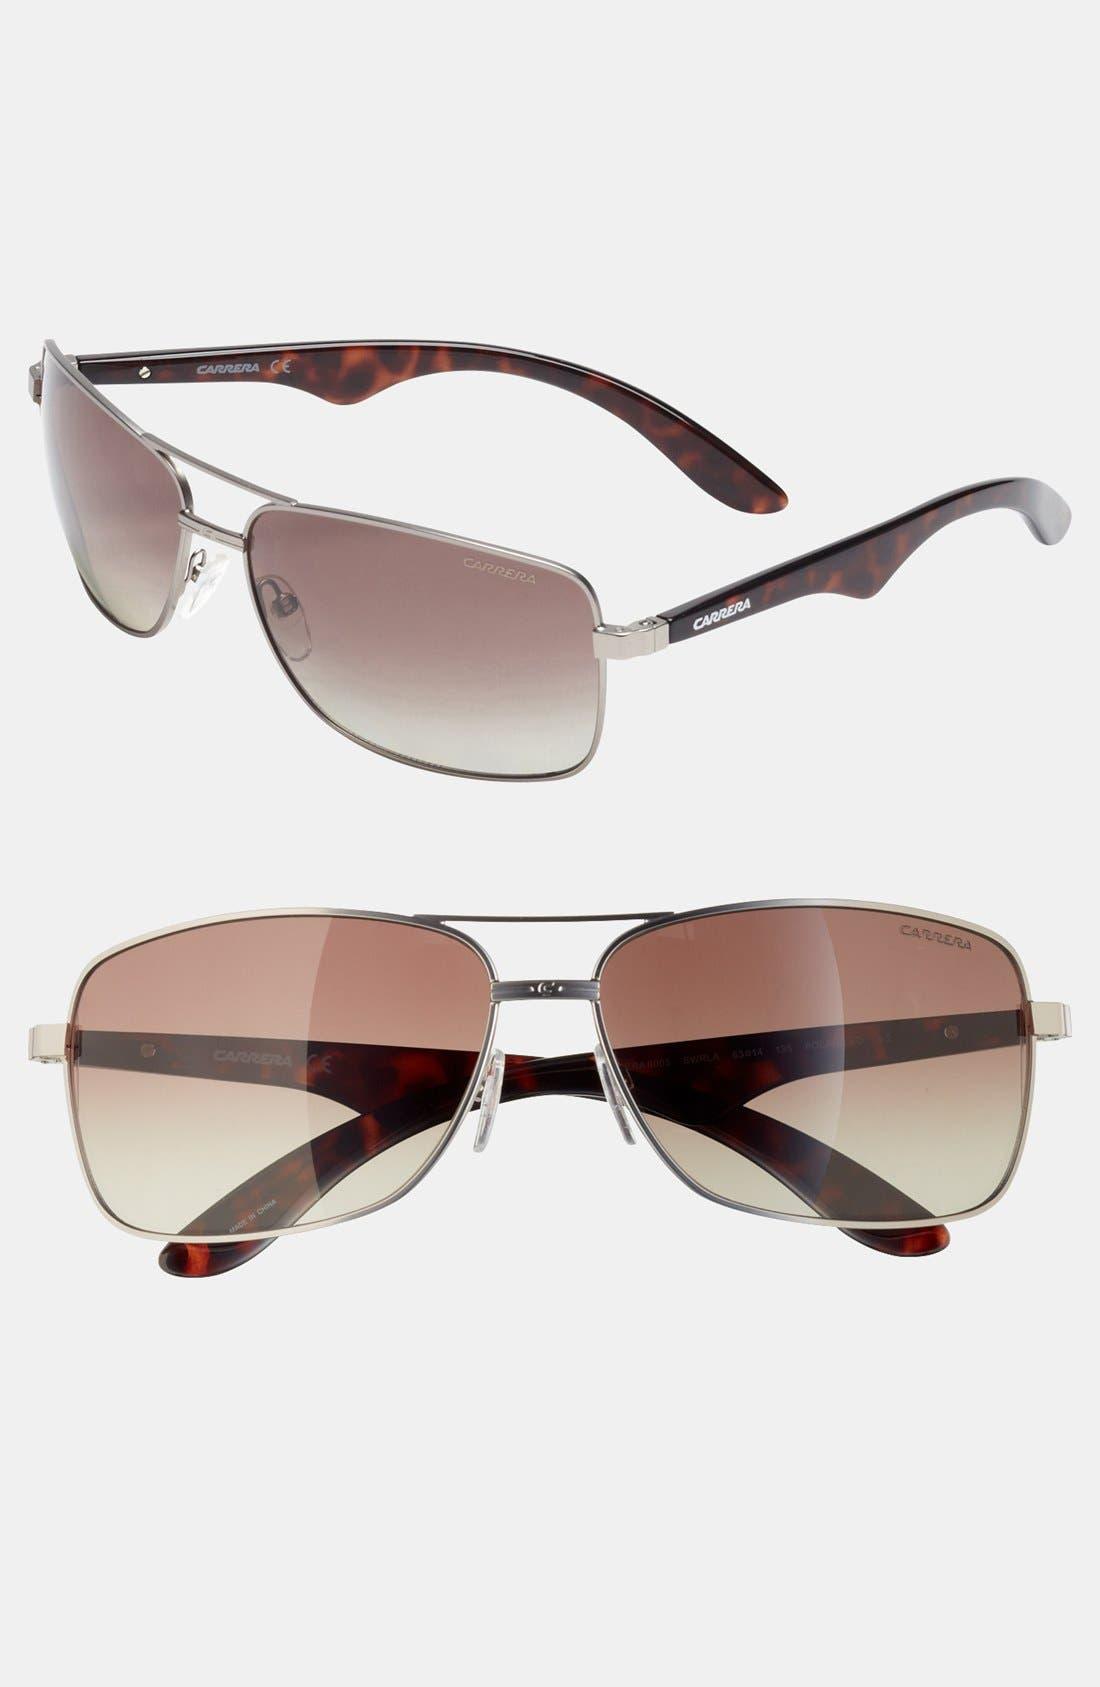 Main Image - Carrera Eyewear 63mm Sunglasses